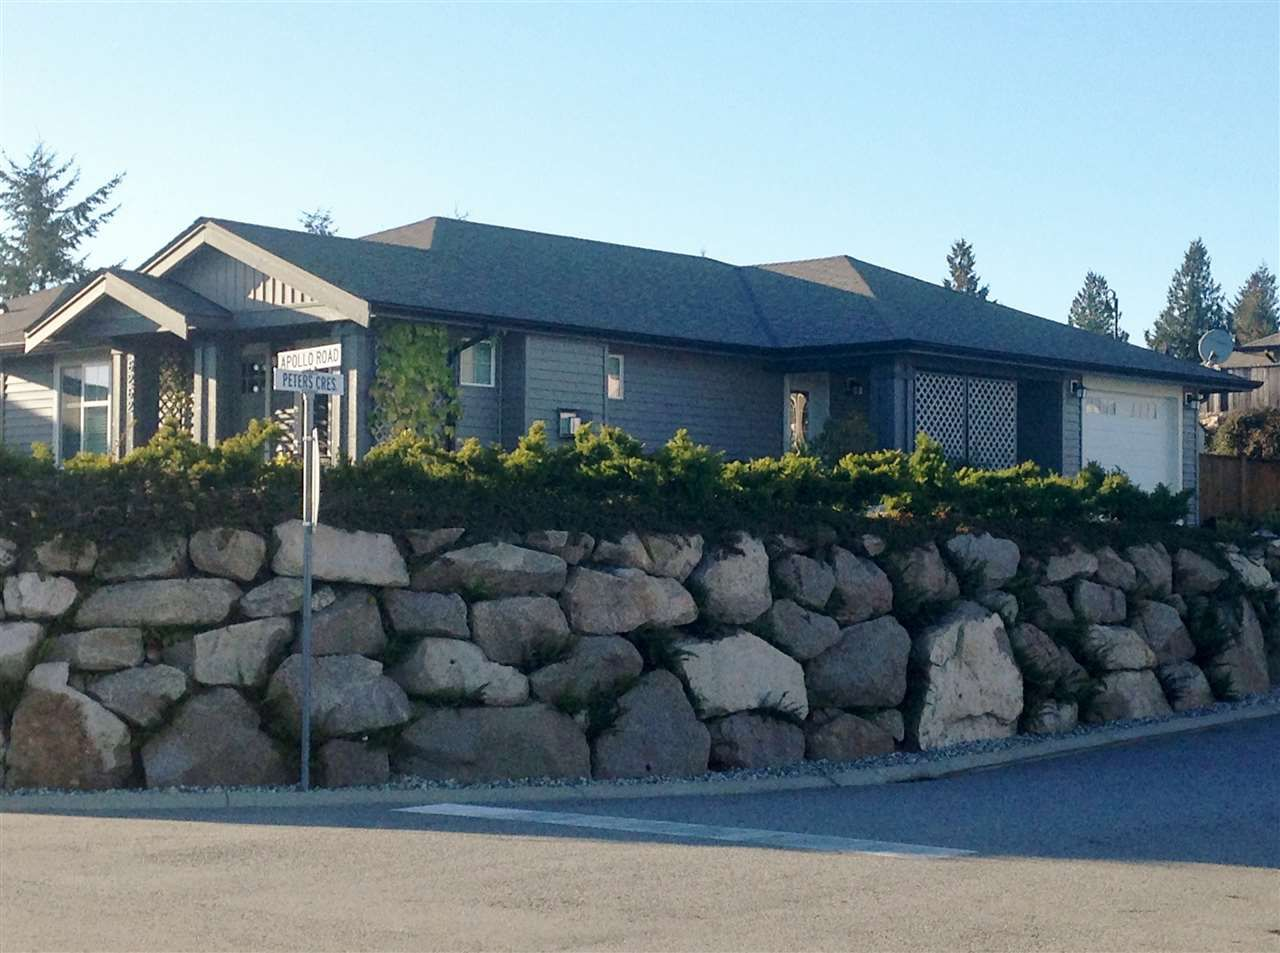 Main Photo: 6262 APOLLO Road in Sechelt: Sechelt District House for sale (Sunshine Coast)  : MLS®# V1137721